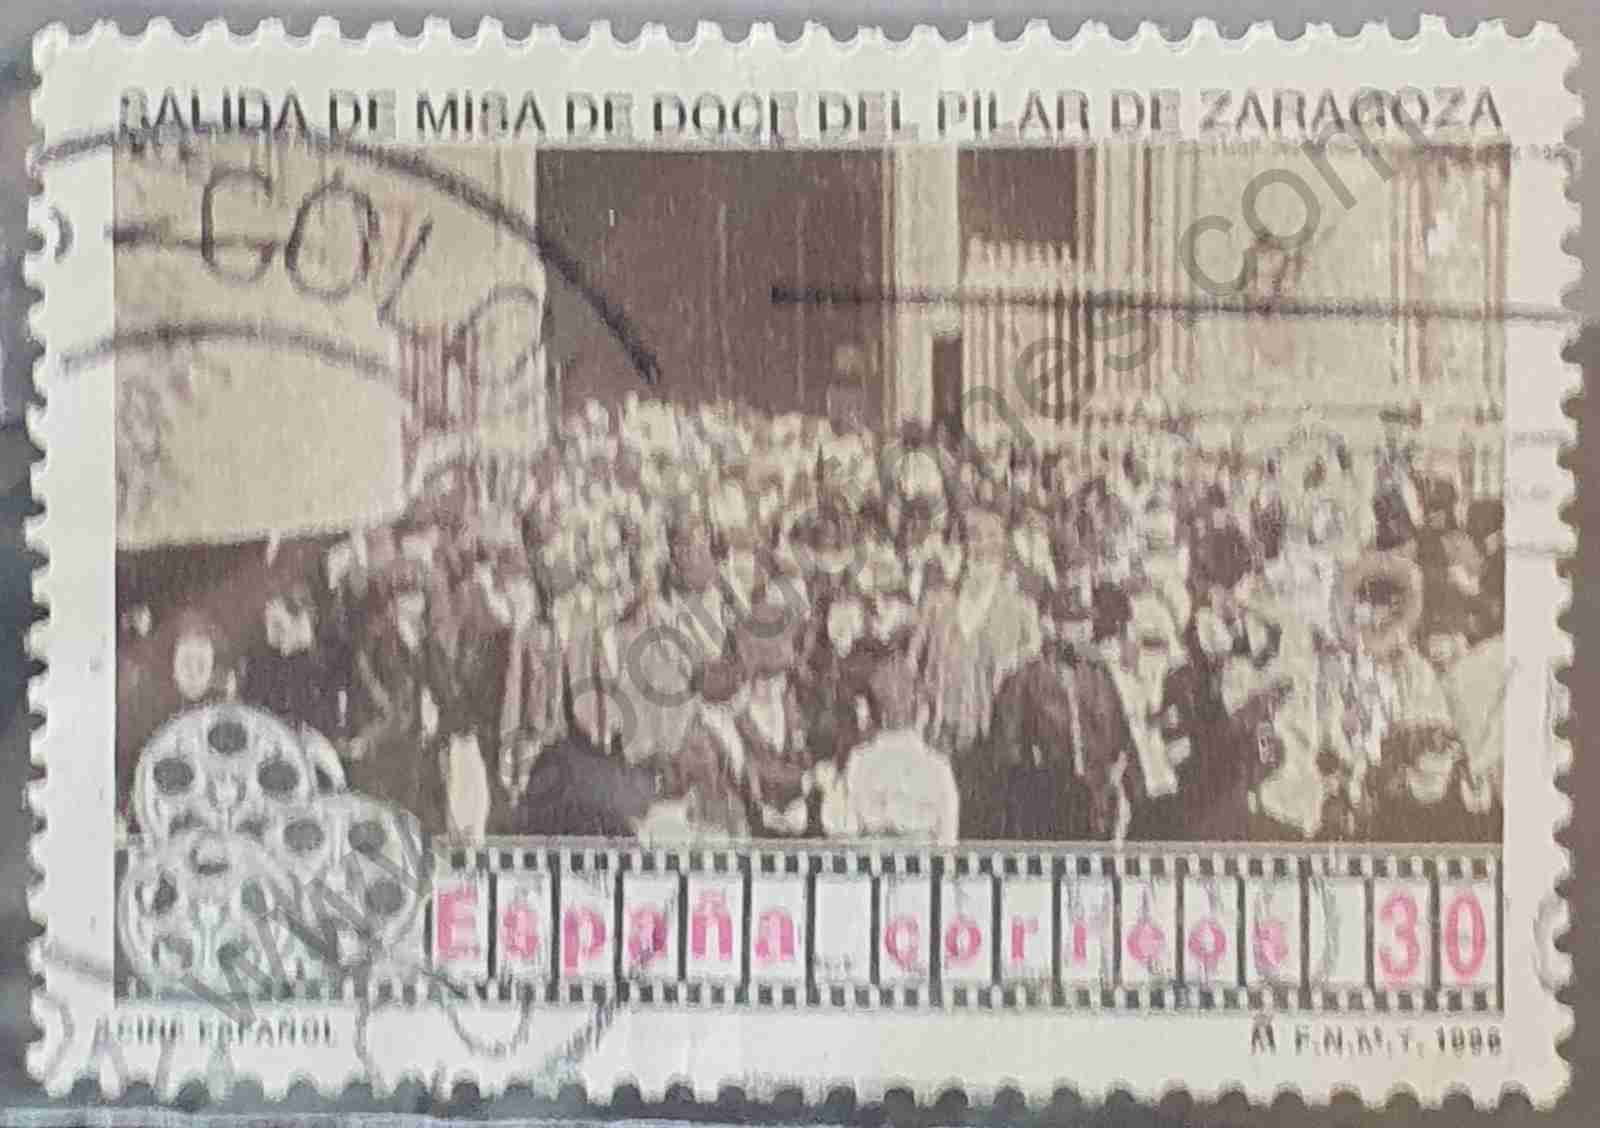 Salida de misa de doce del Pilar - Sello España 1996